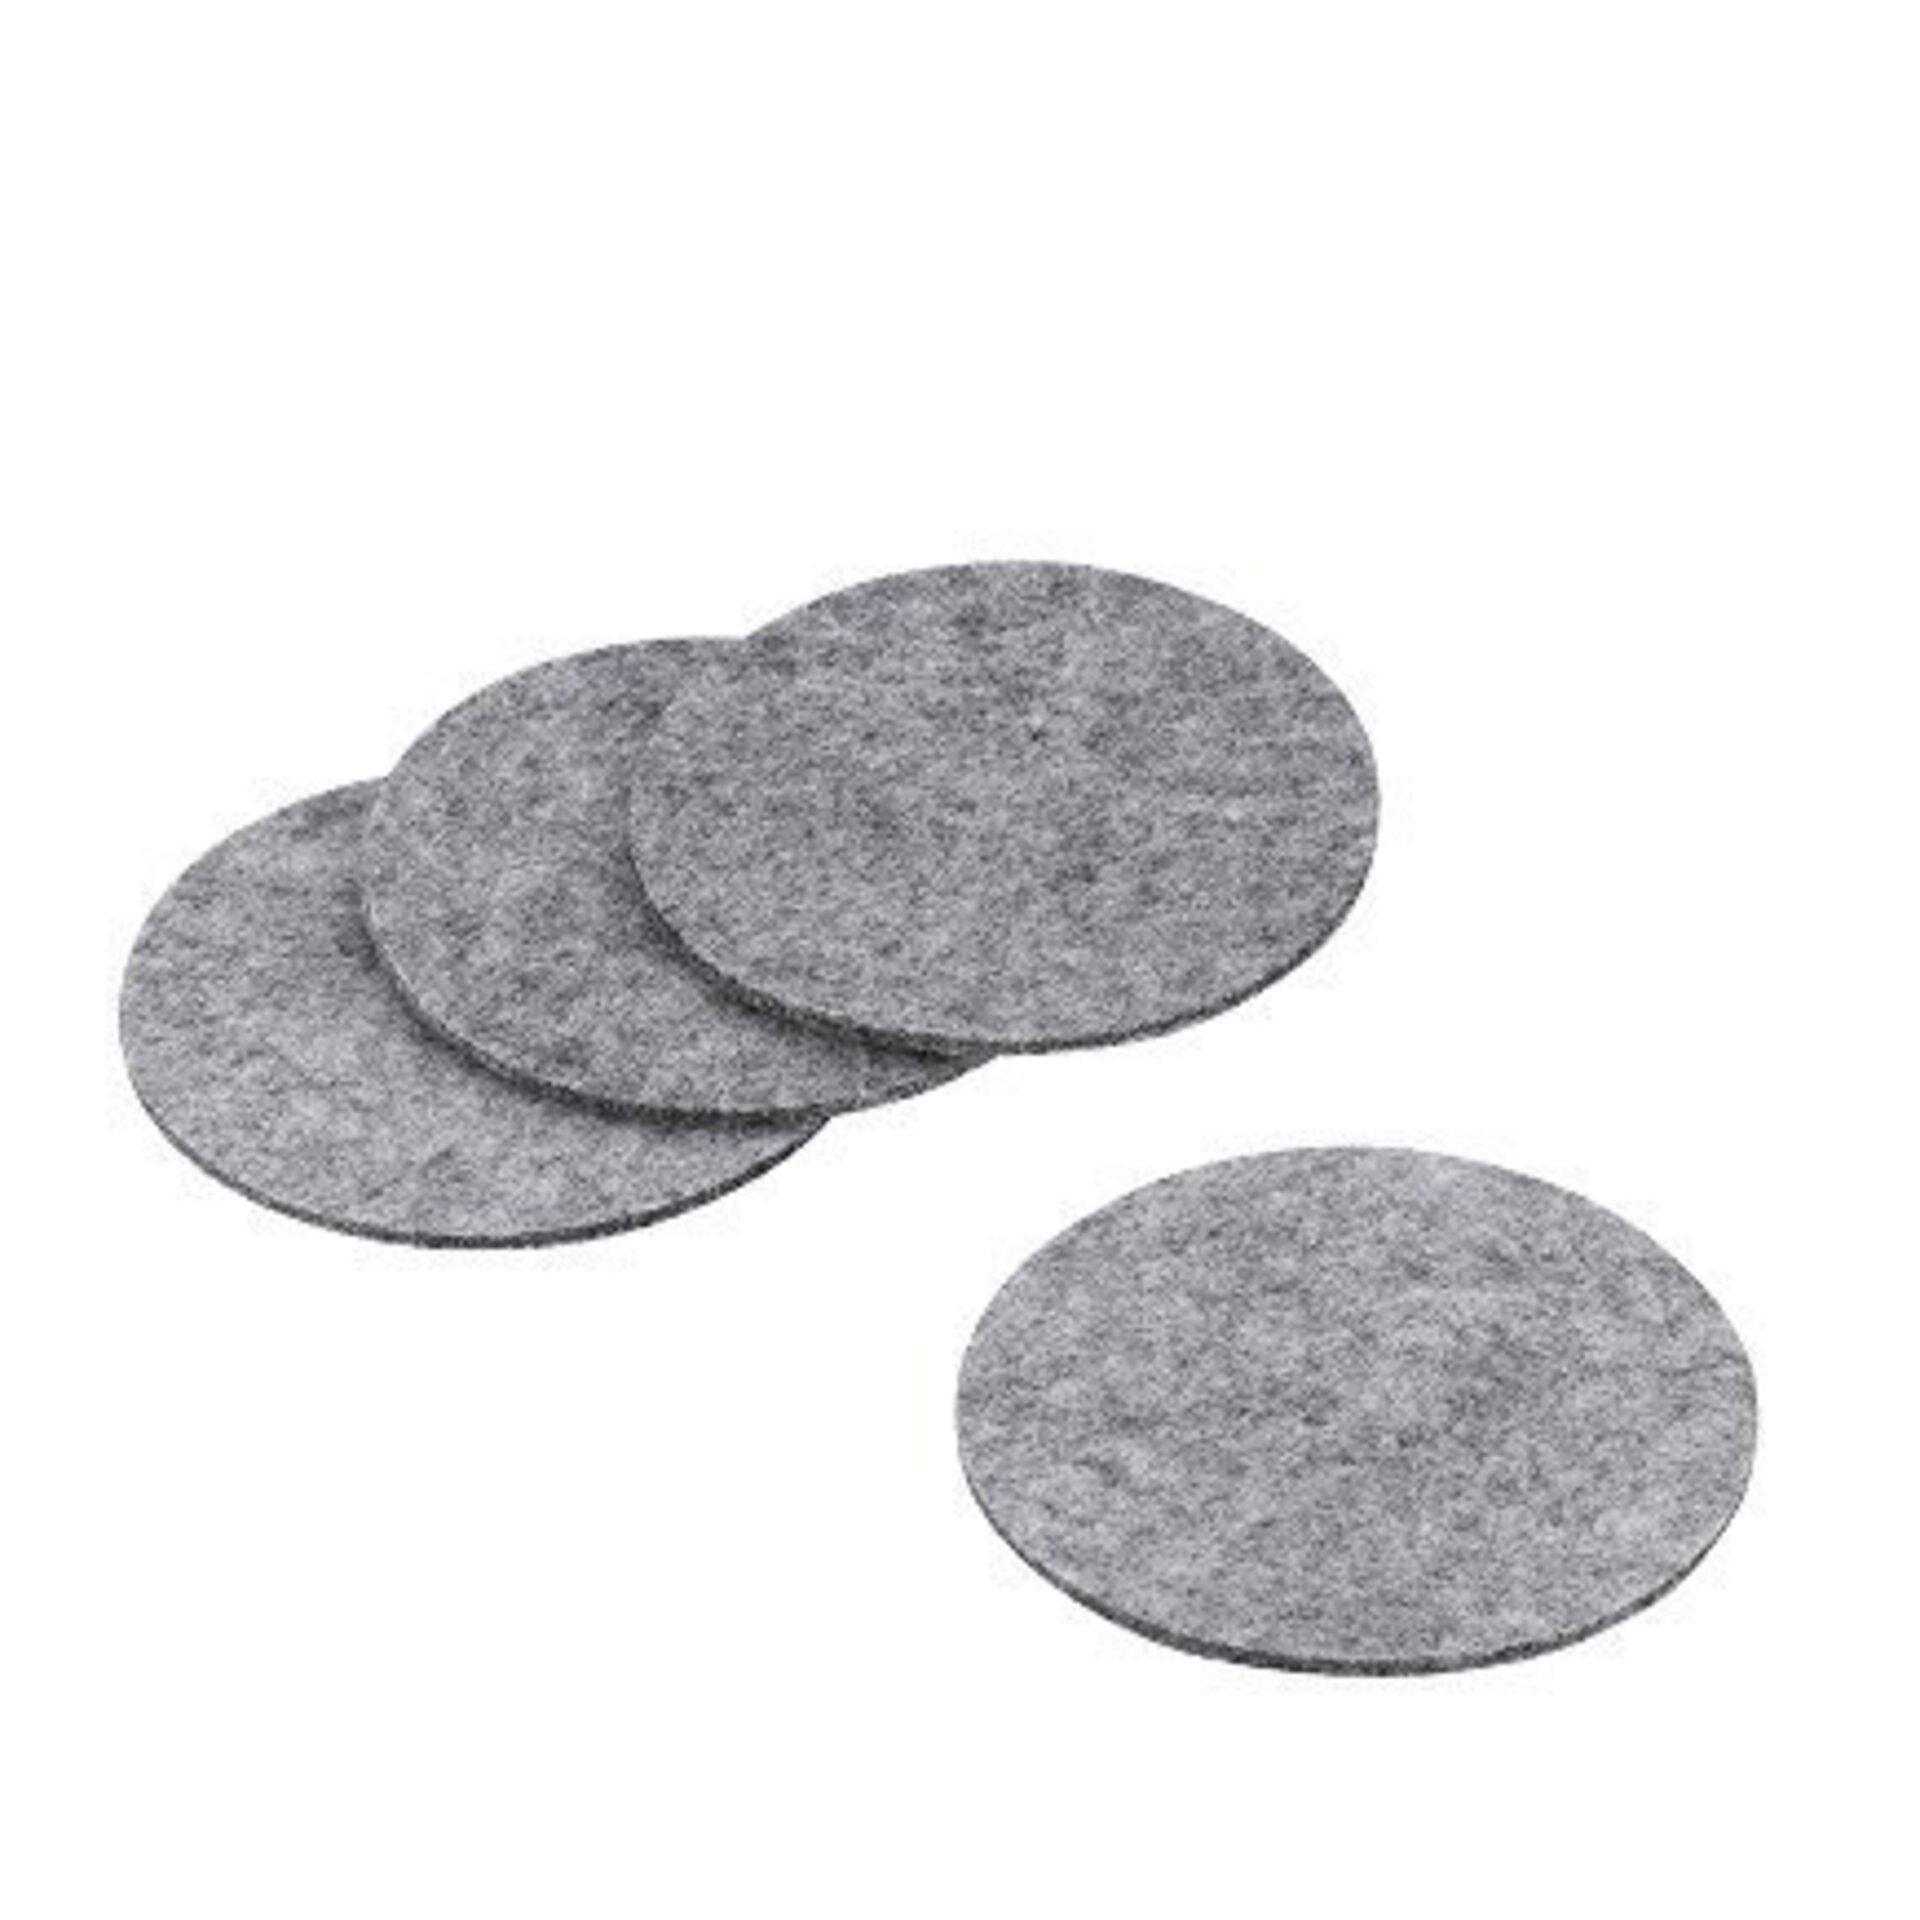 Tischset Alia Kela Textil grau